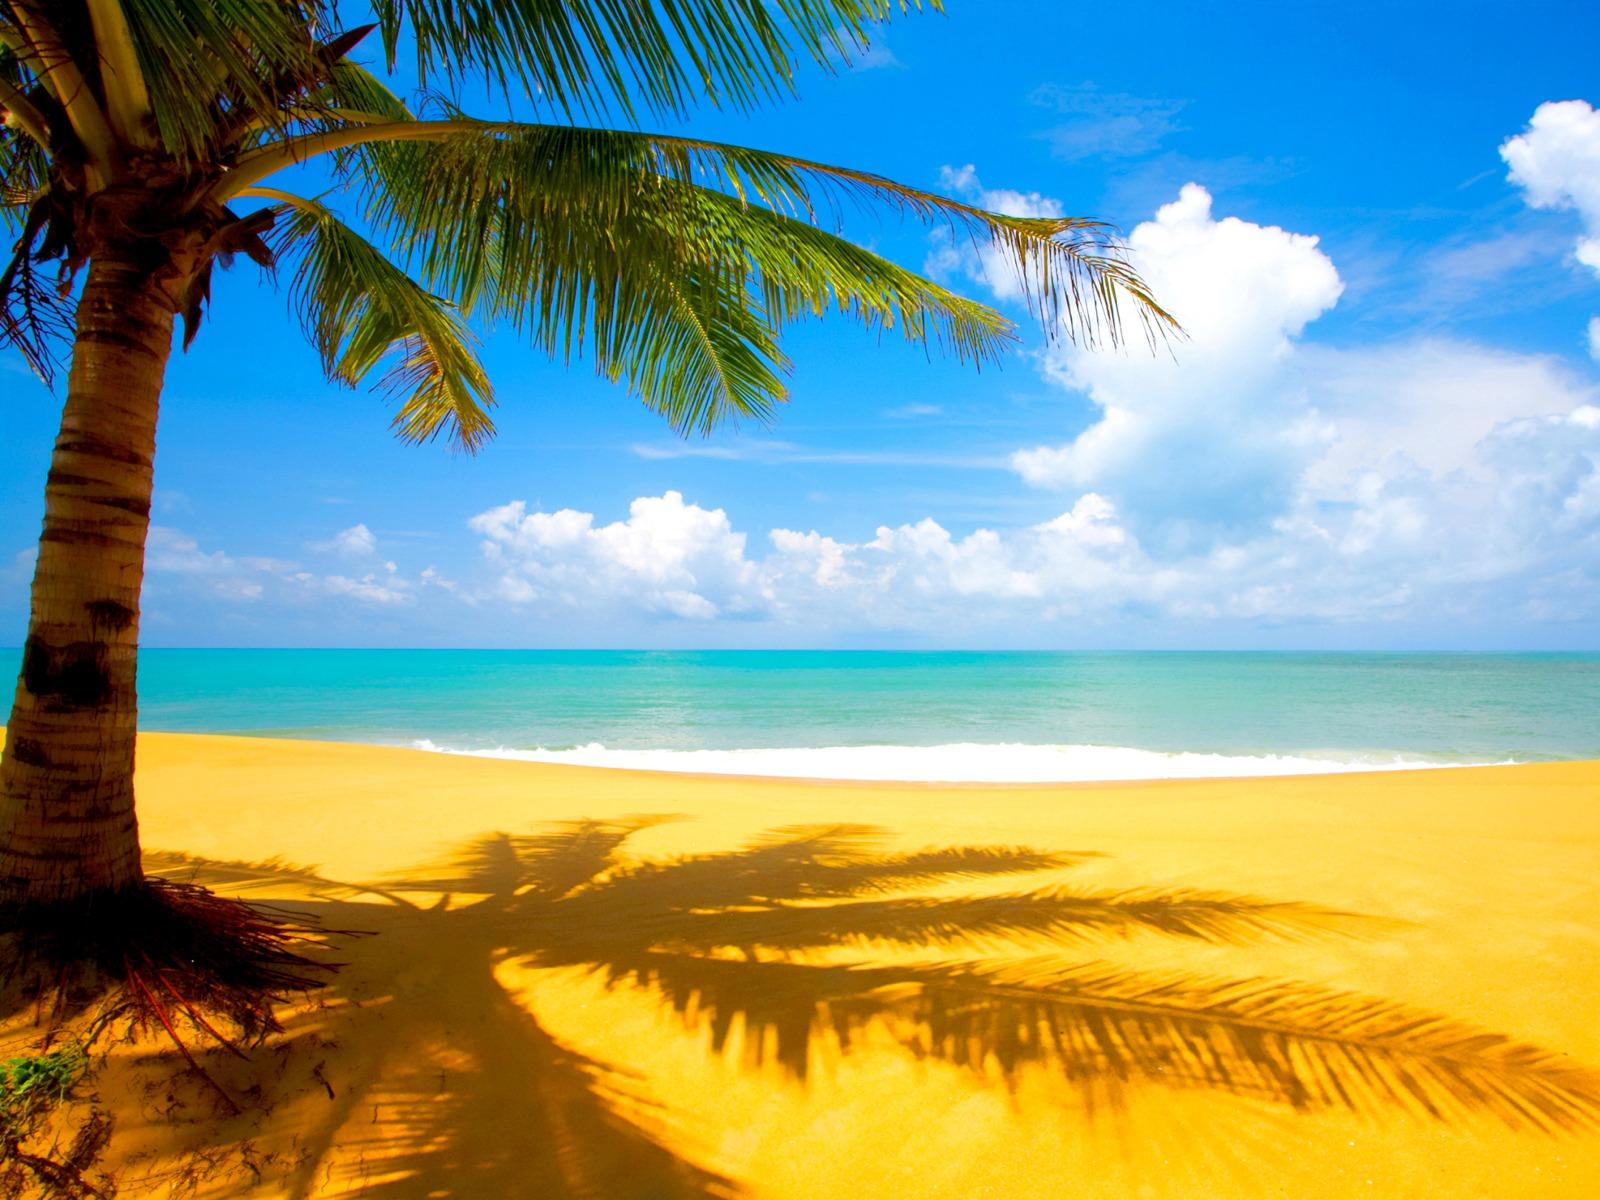 http://2.bp.blogspot.com/-MQ459CYTdVc/T8Xx-g4YHfI/AAAAAAAAAb4/I2CZWbS6GcA/s1600/Beach+Wallpaper+Pao.jpg